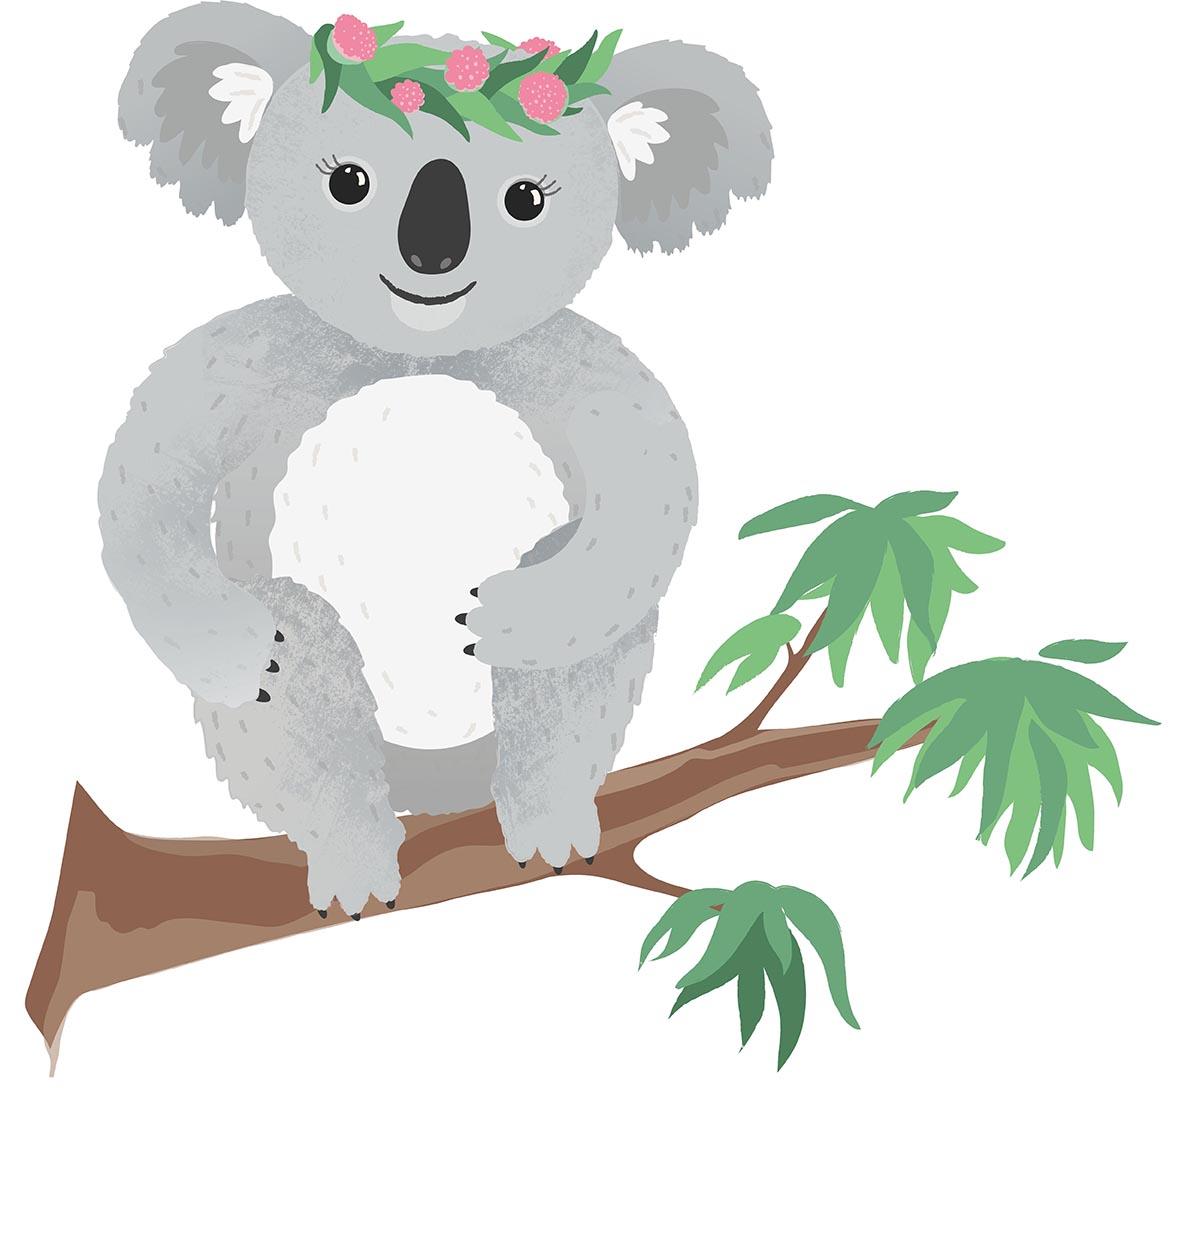 Koala_kleine-Datei5b164b401f439